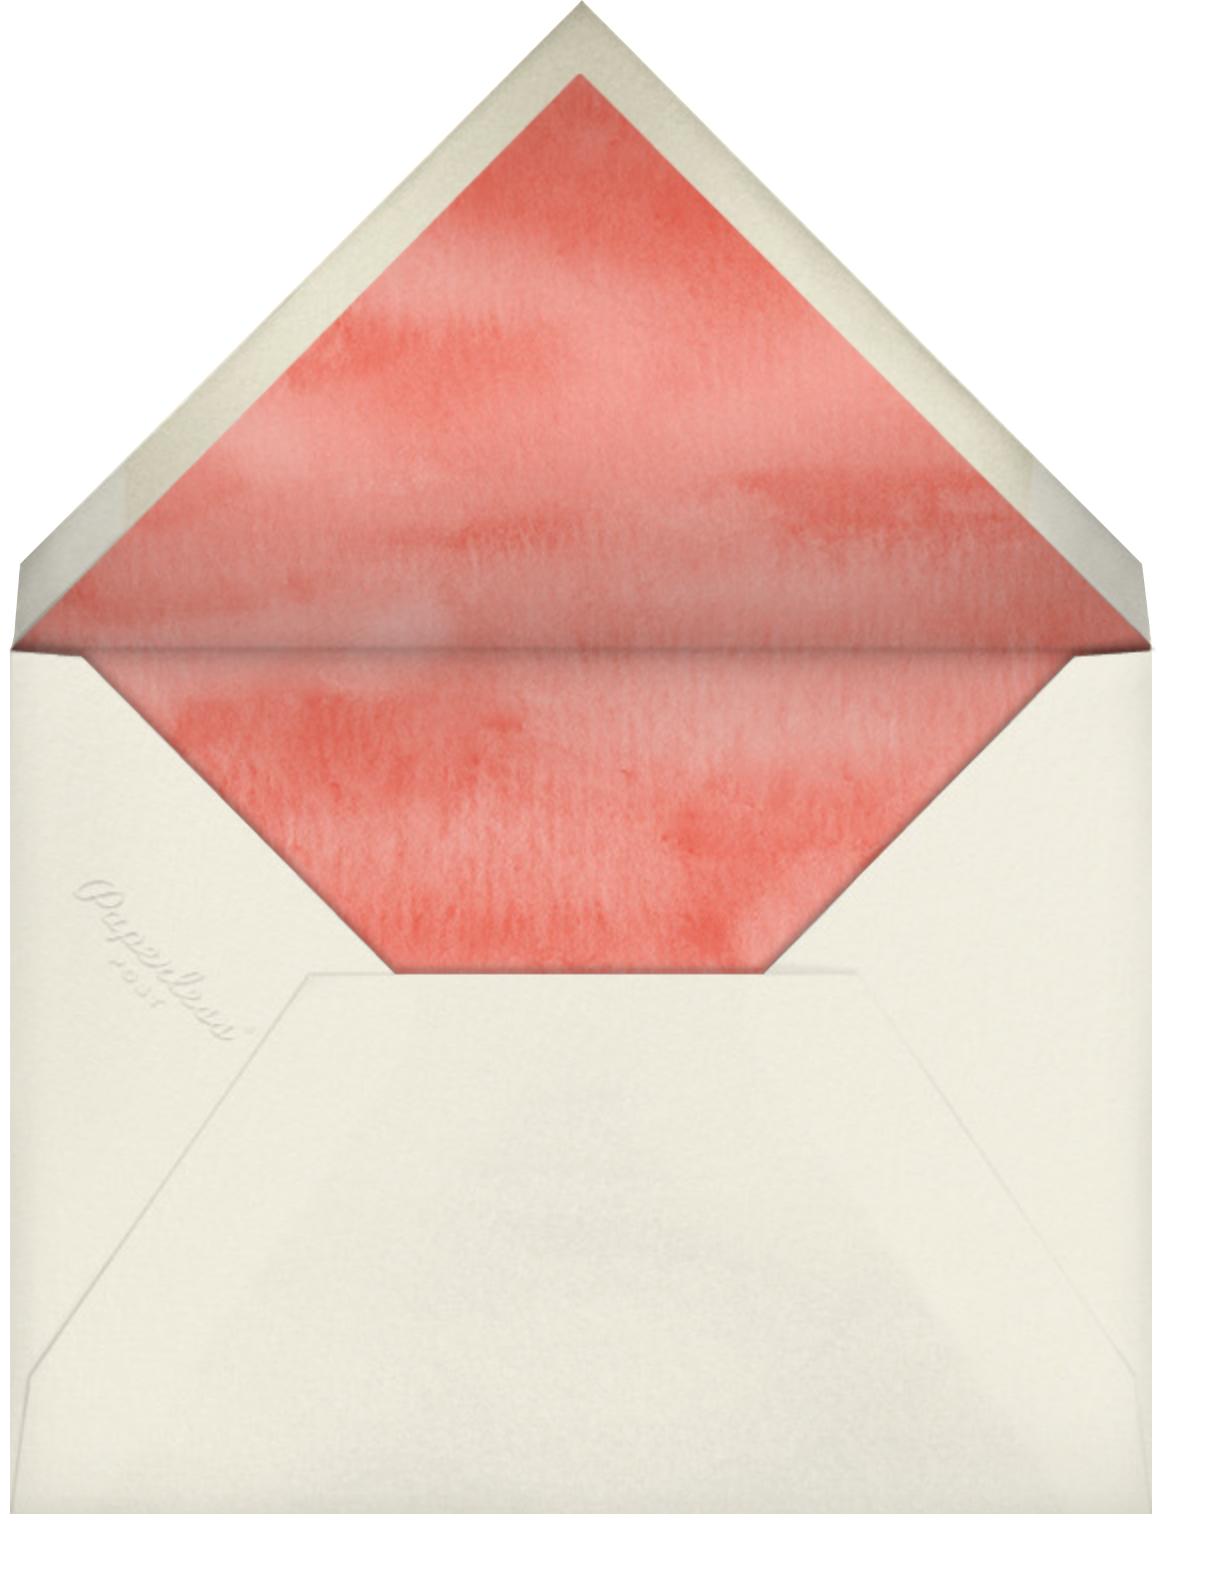 Choo Choo - Felix Doolittle - Kids' birthday - envelope back